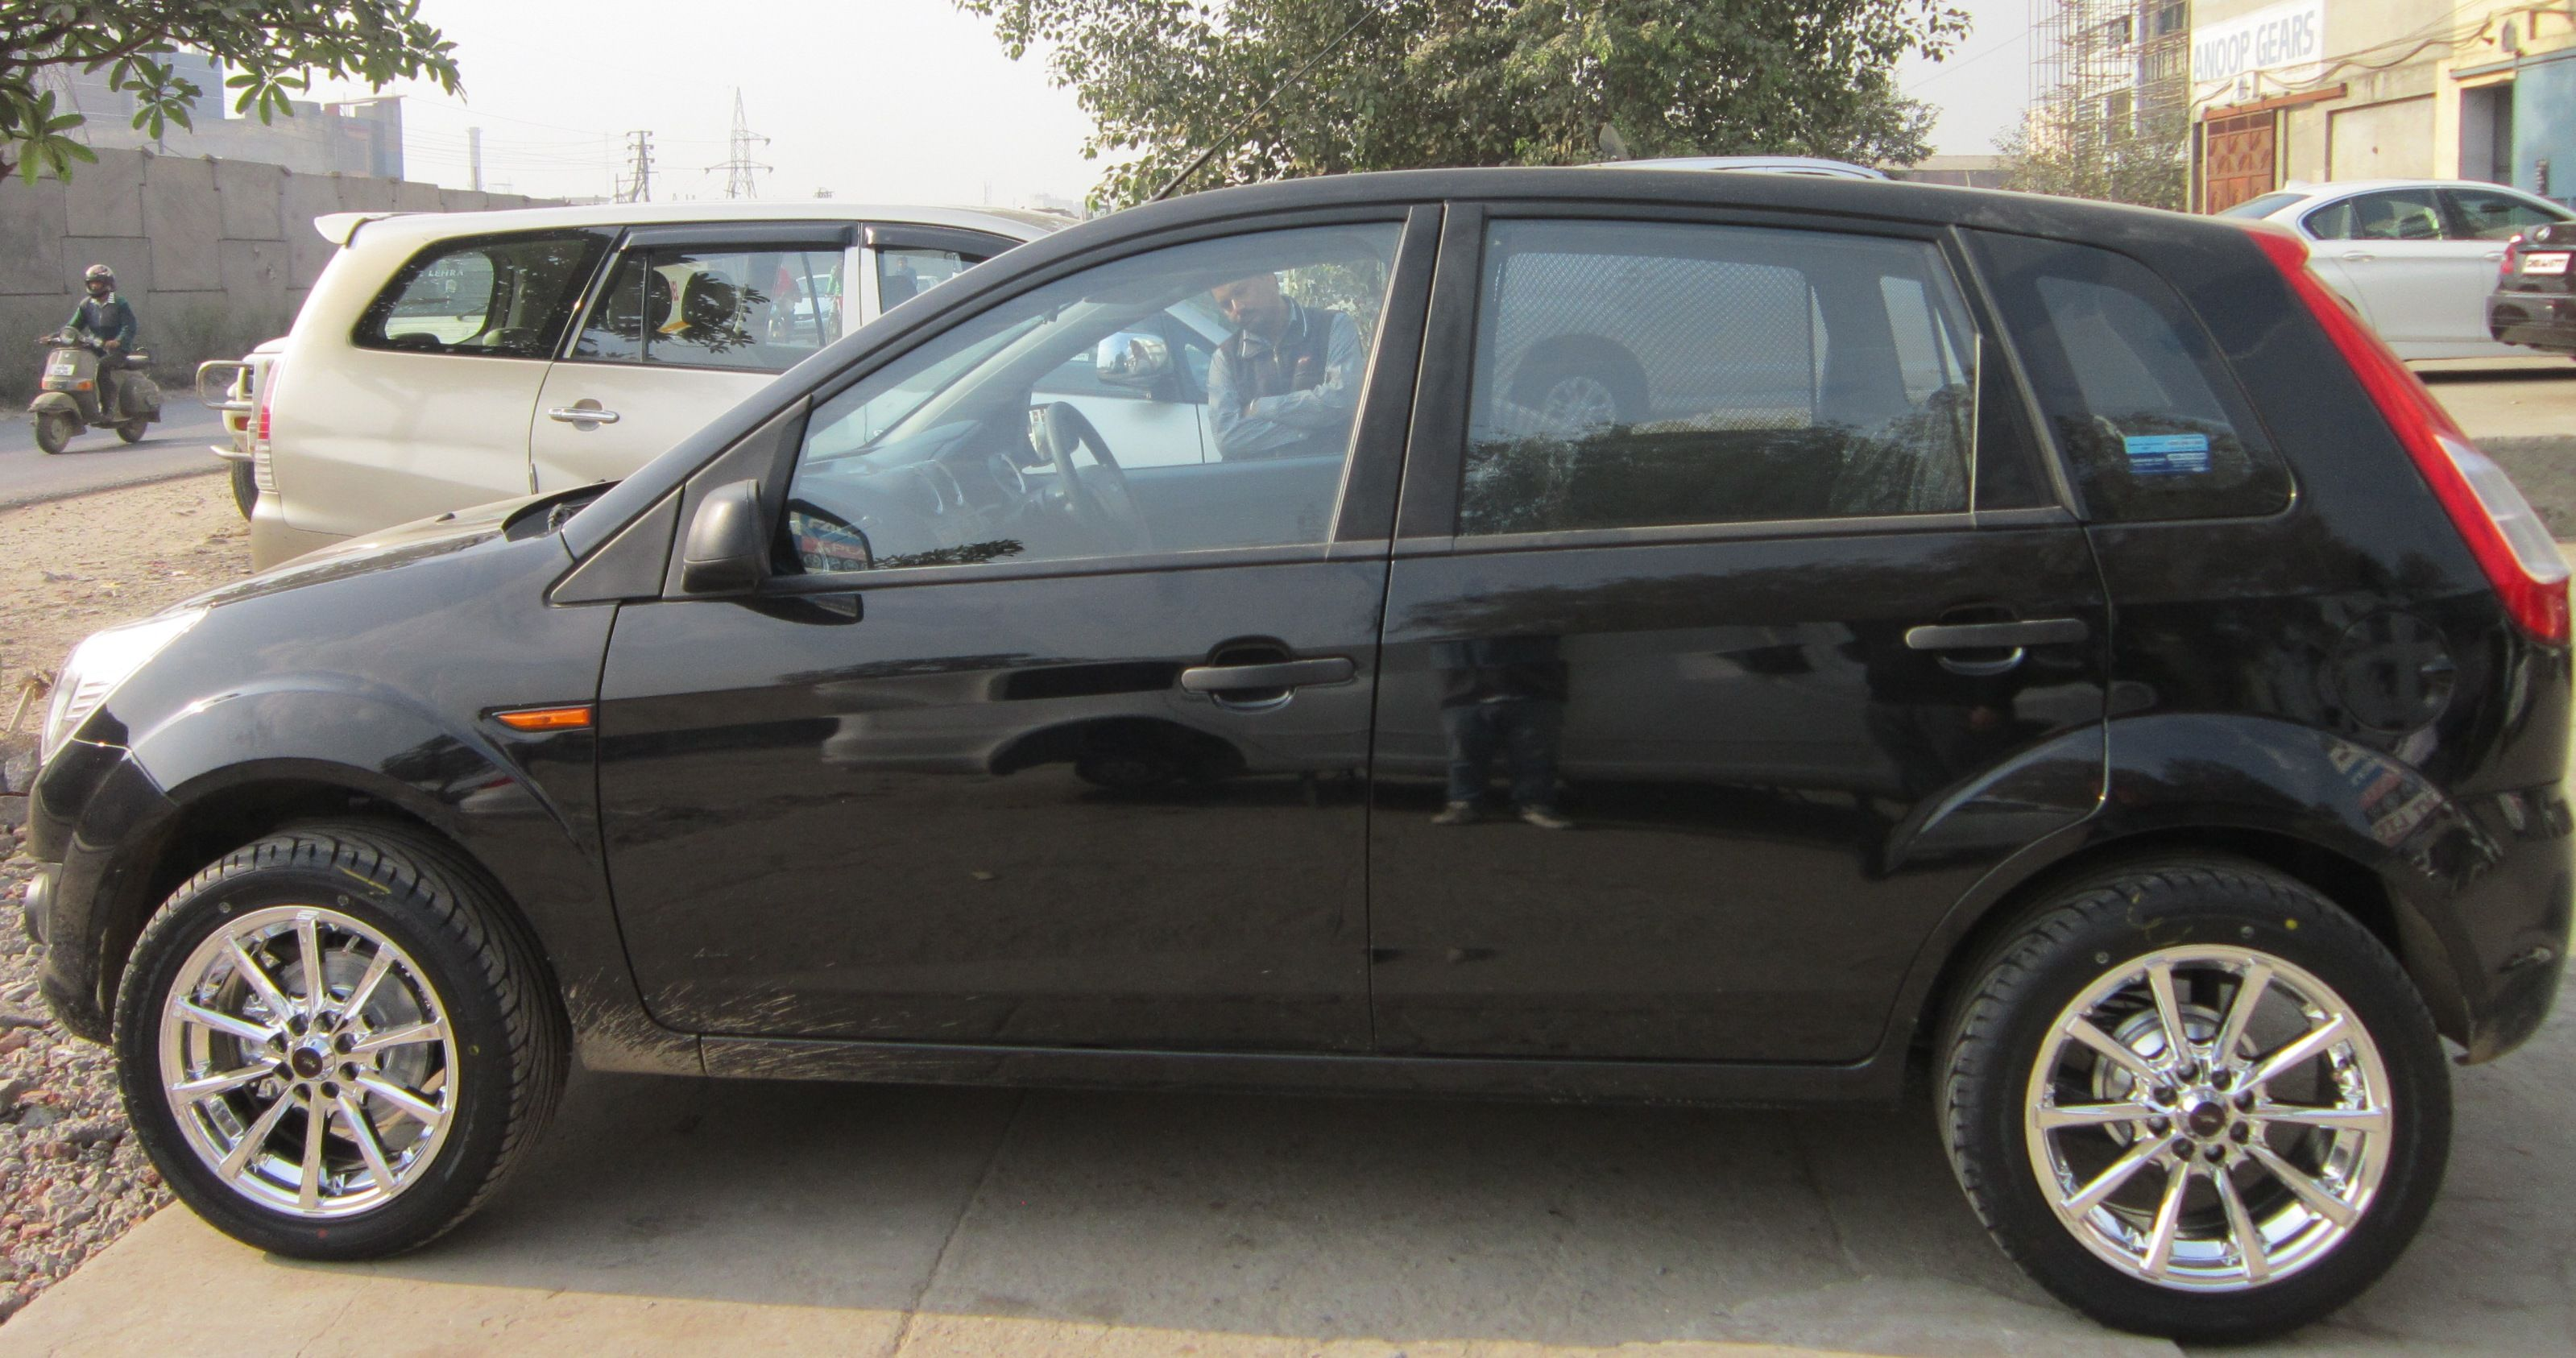 Plati Alloys In Ford Figo Pp 9018 100 108x8 16 Visit Www